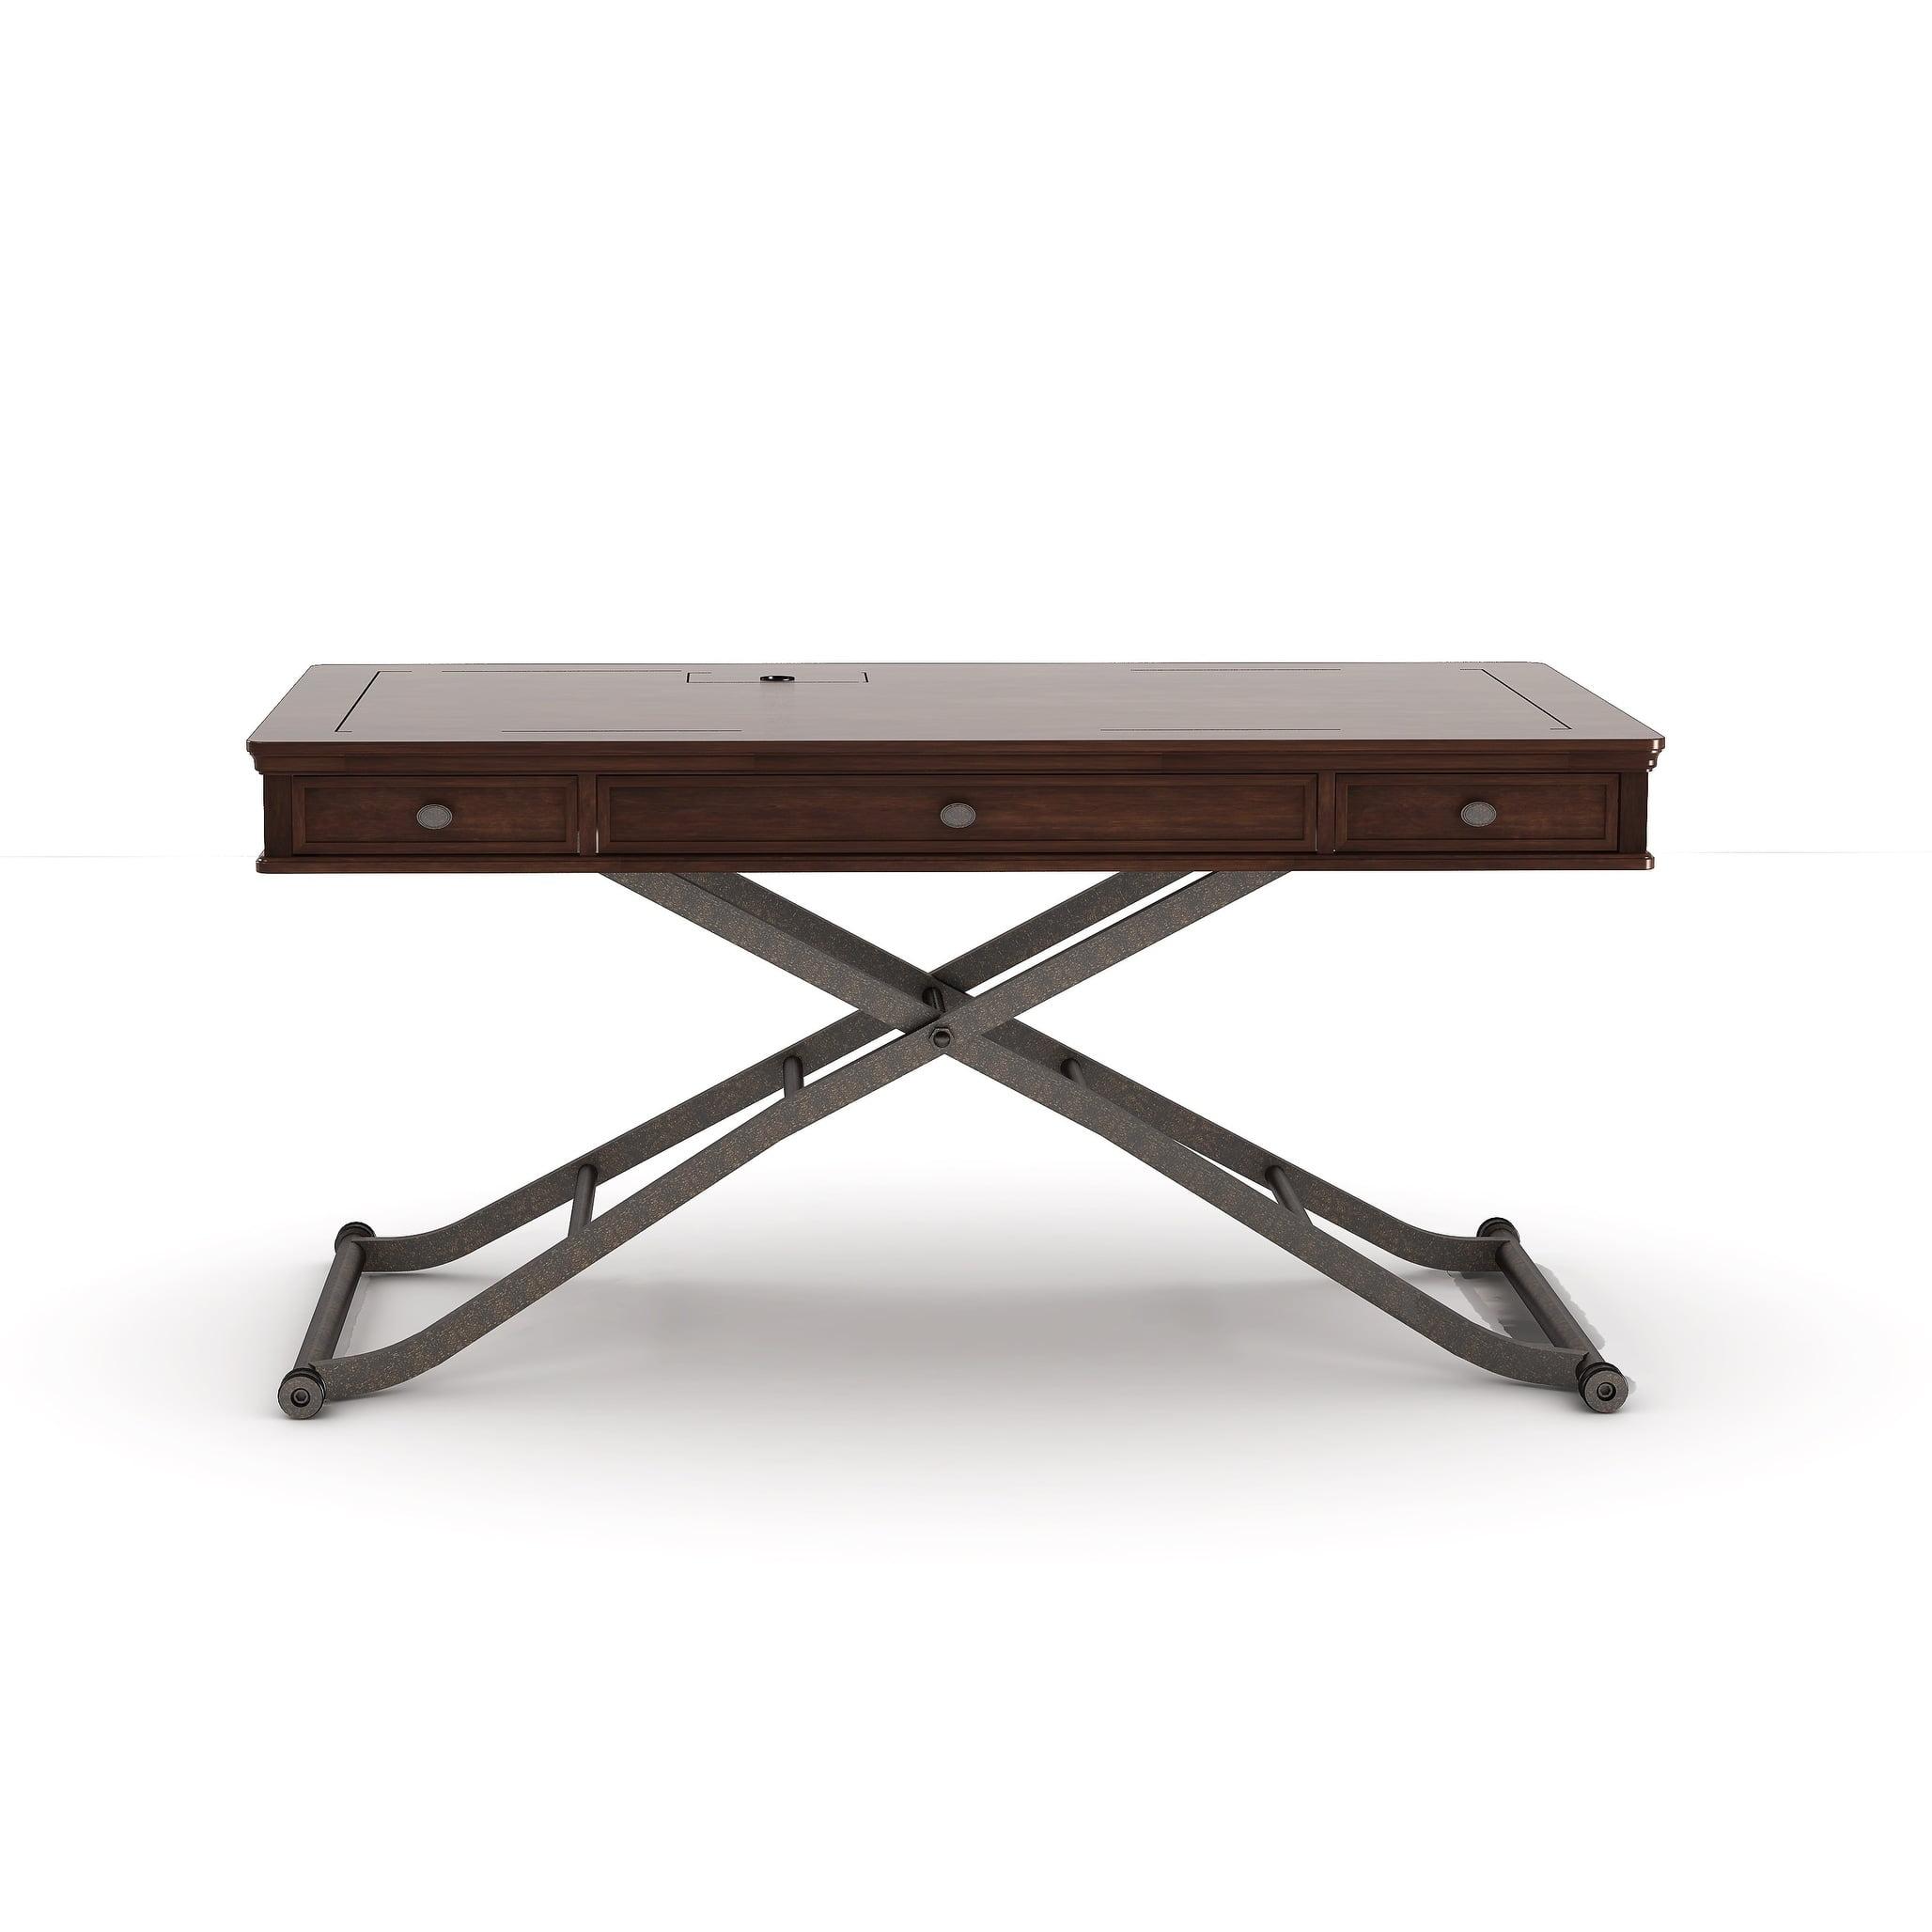 Excellent Turnkey Products Belmont Sit N Stand Desk Interior Design Ideas Clesiryabchikinfo